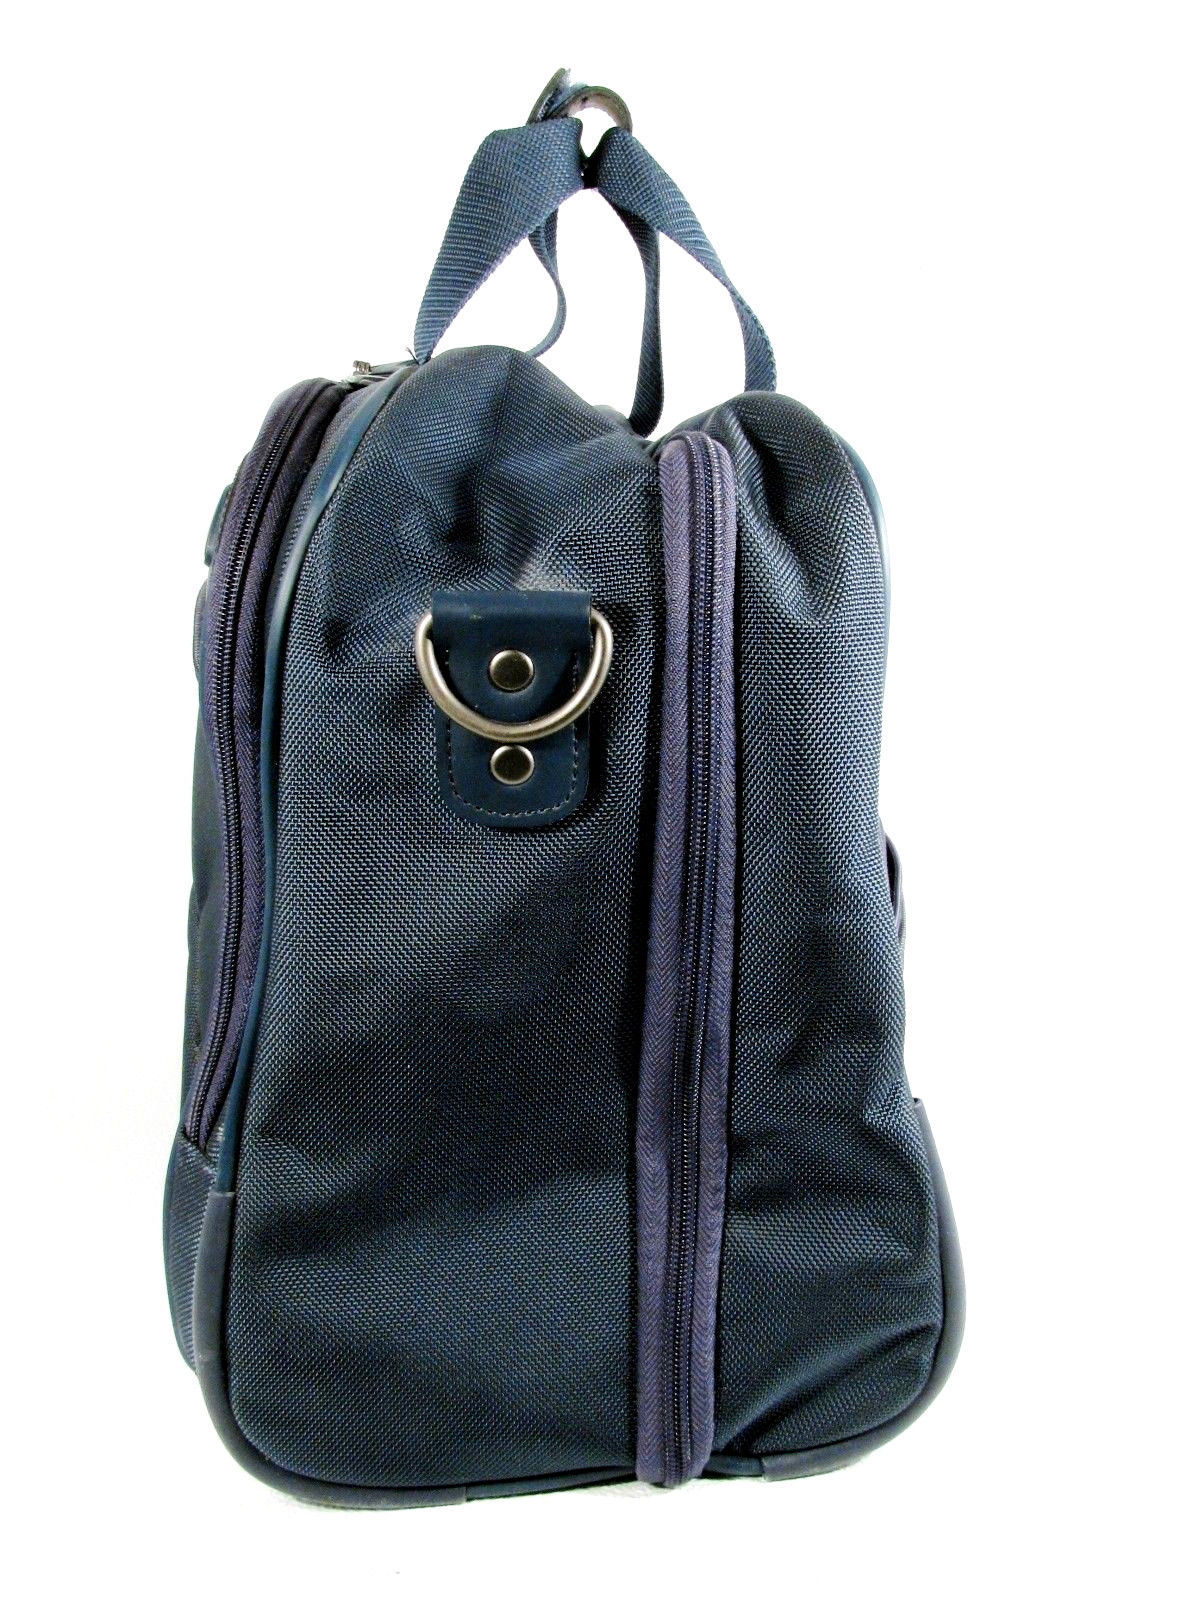 Samsonite Duffle Bag Overnight Travel Carry On Organizer Blue Nylon